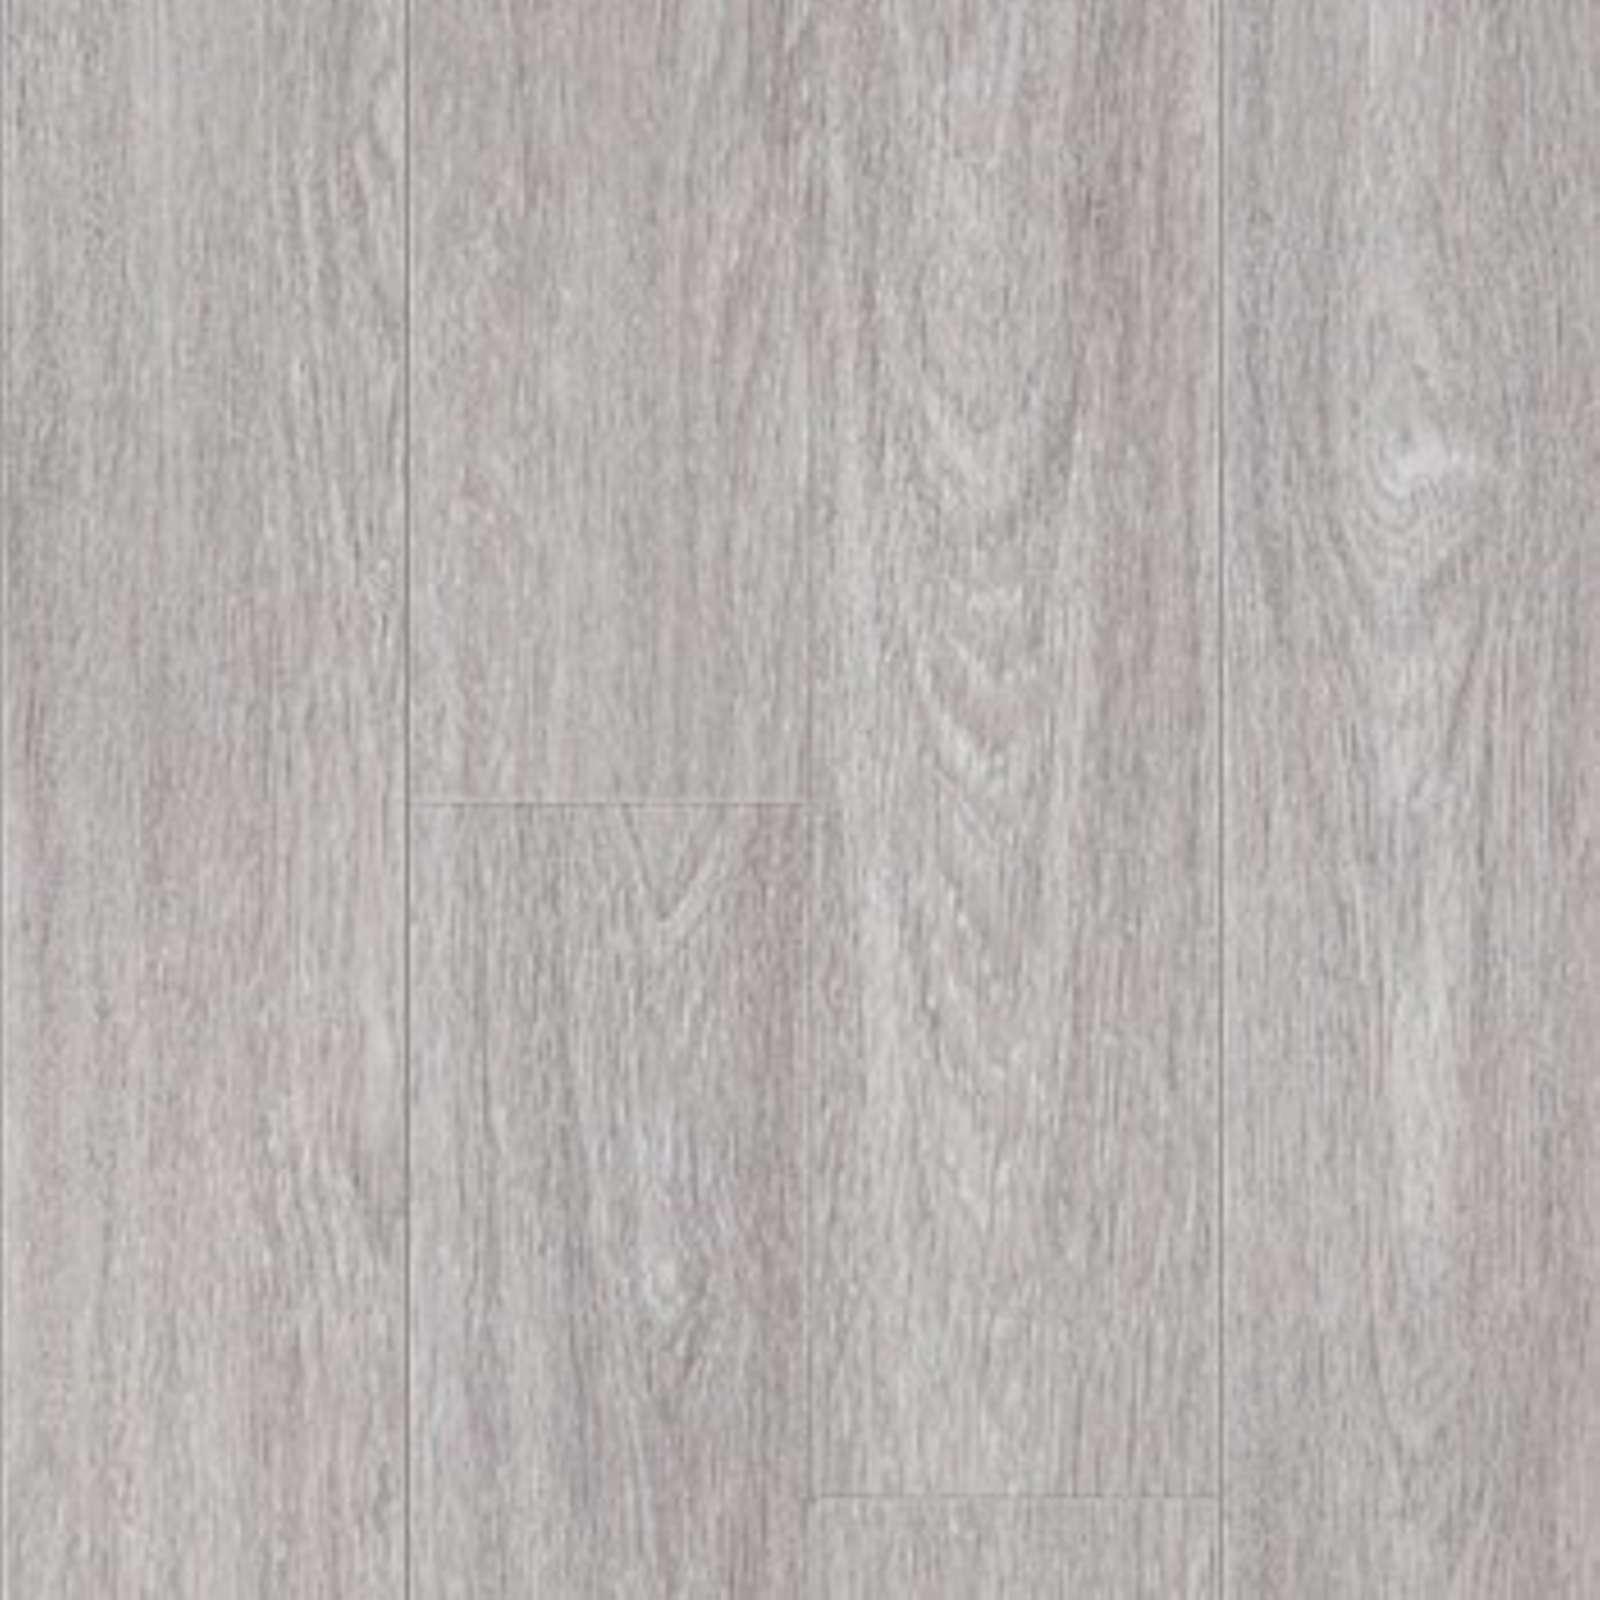 Плитка ПВХ Tarkett Art Vinil Lounge Studio 101,6х914,4x3 мм (2,04м2/22шт/уп) 257010008